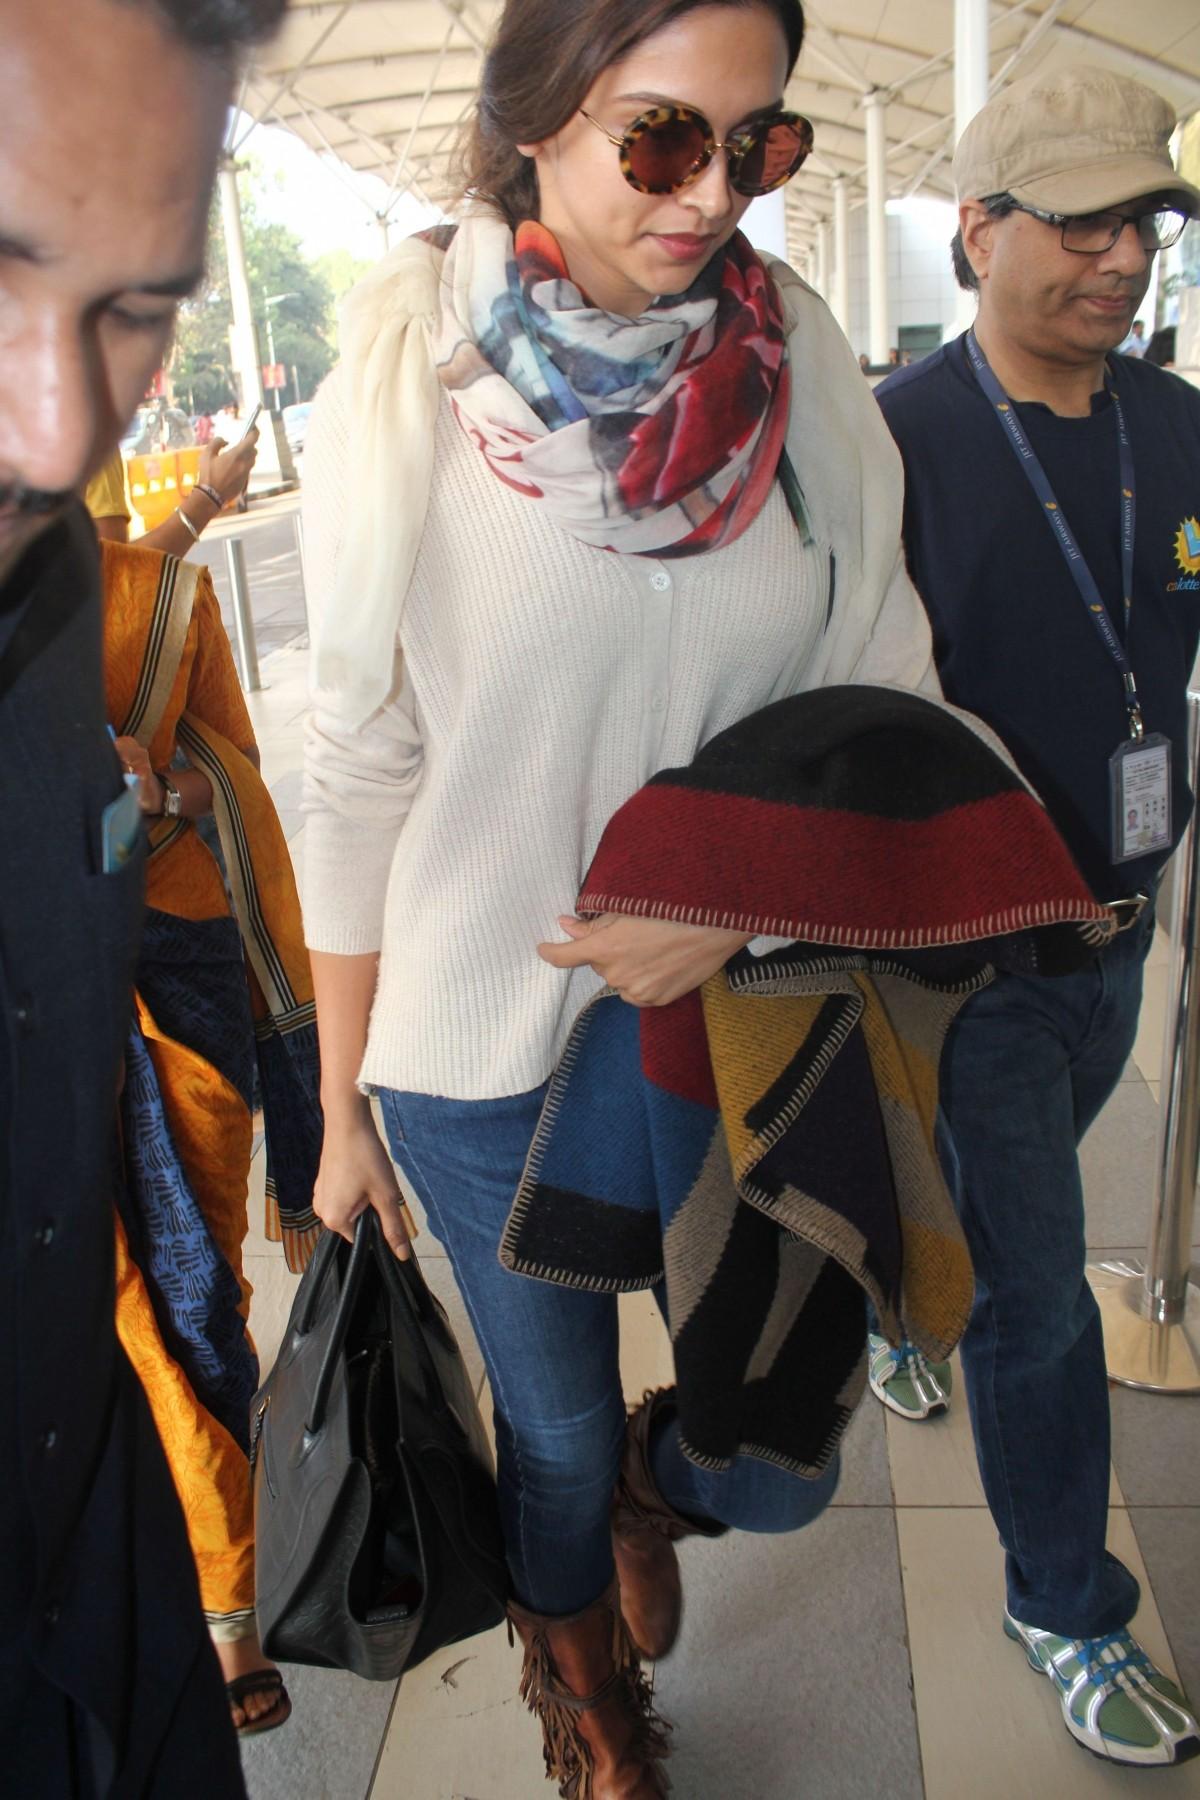 Deepika Padukone, Vivek Oberoi, Jaya Bachchan and Other Celebs Spotted at Mumbai Airport